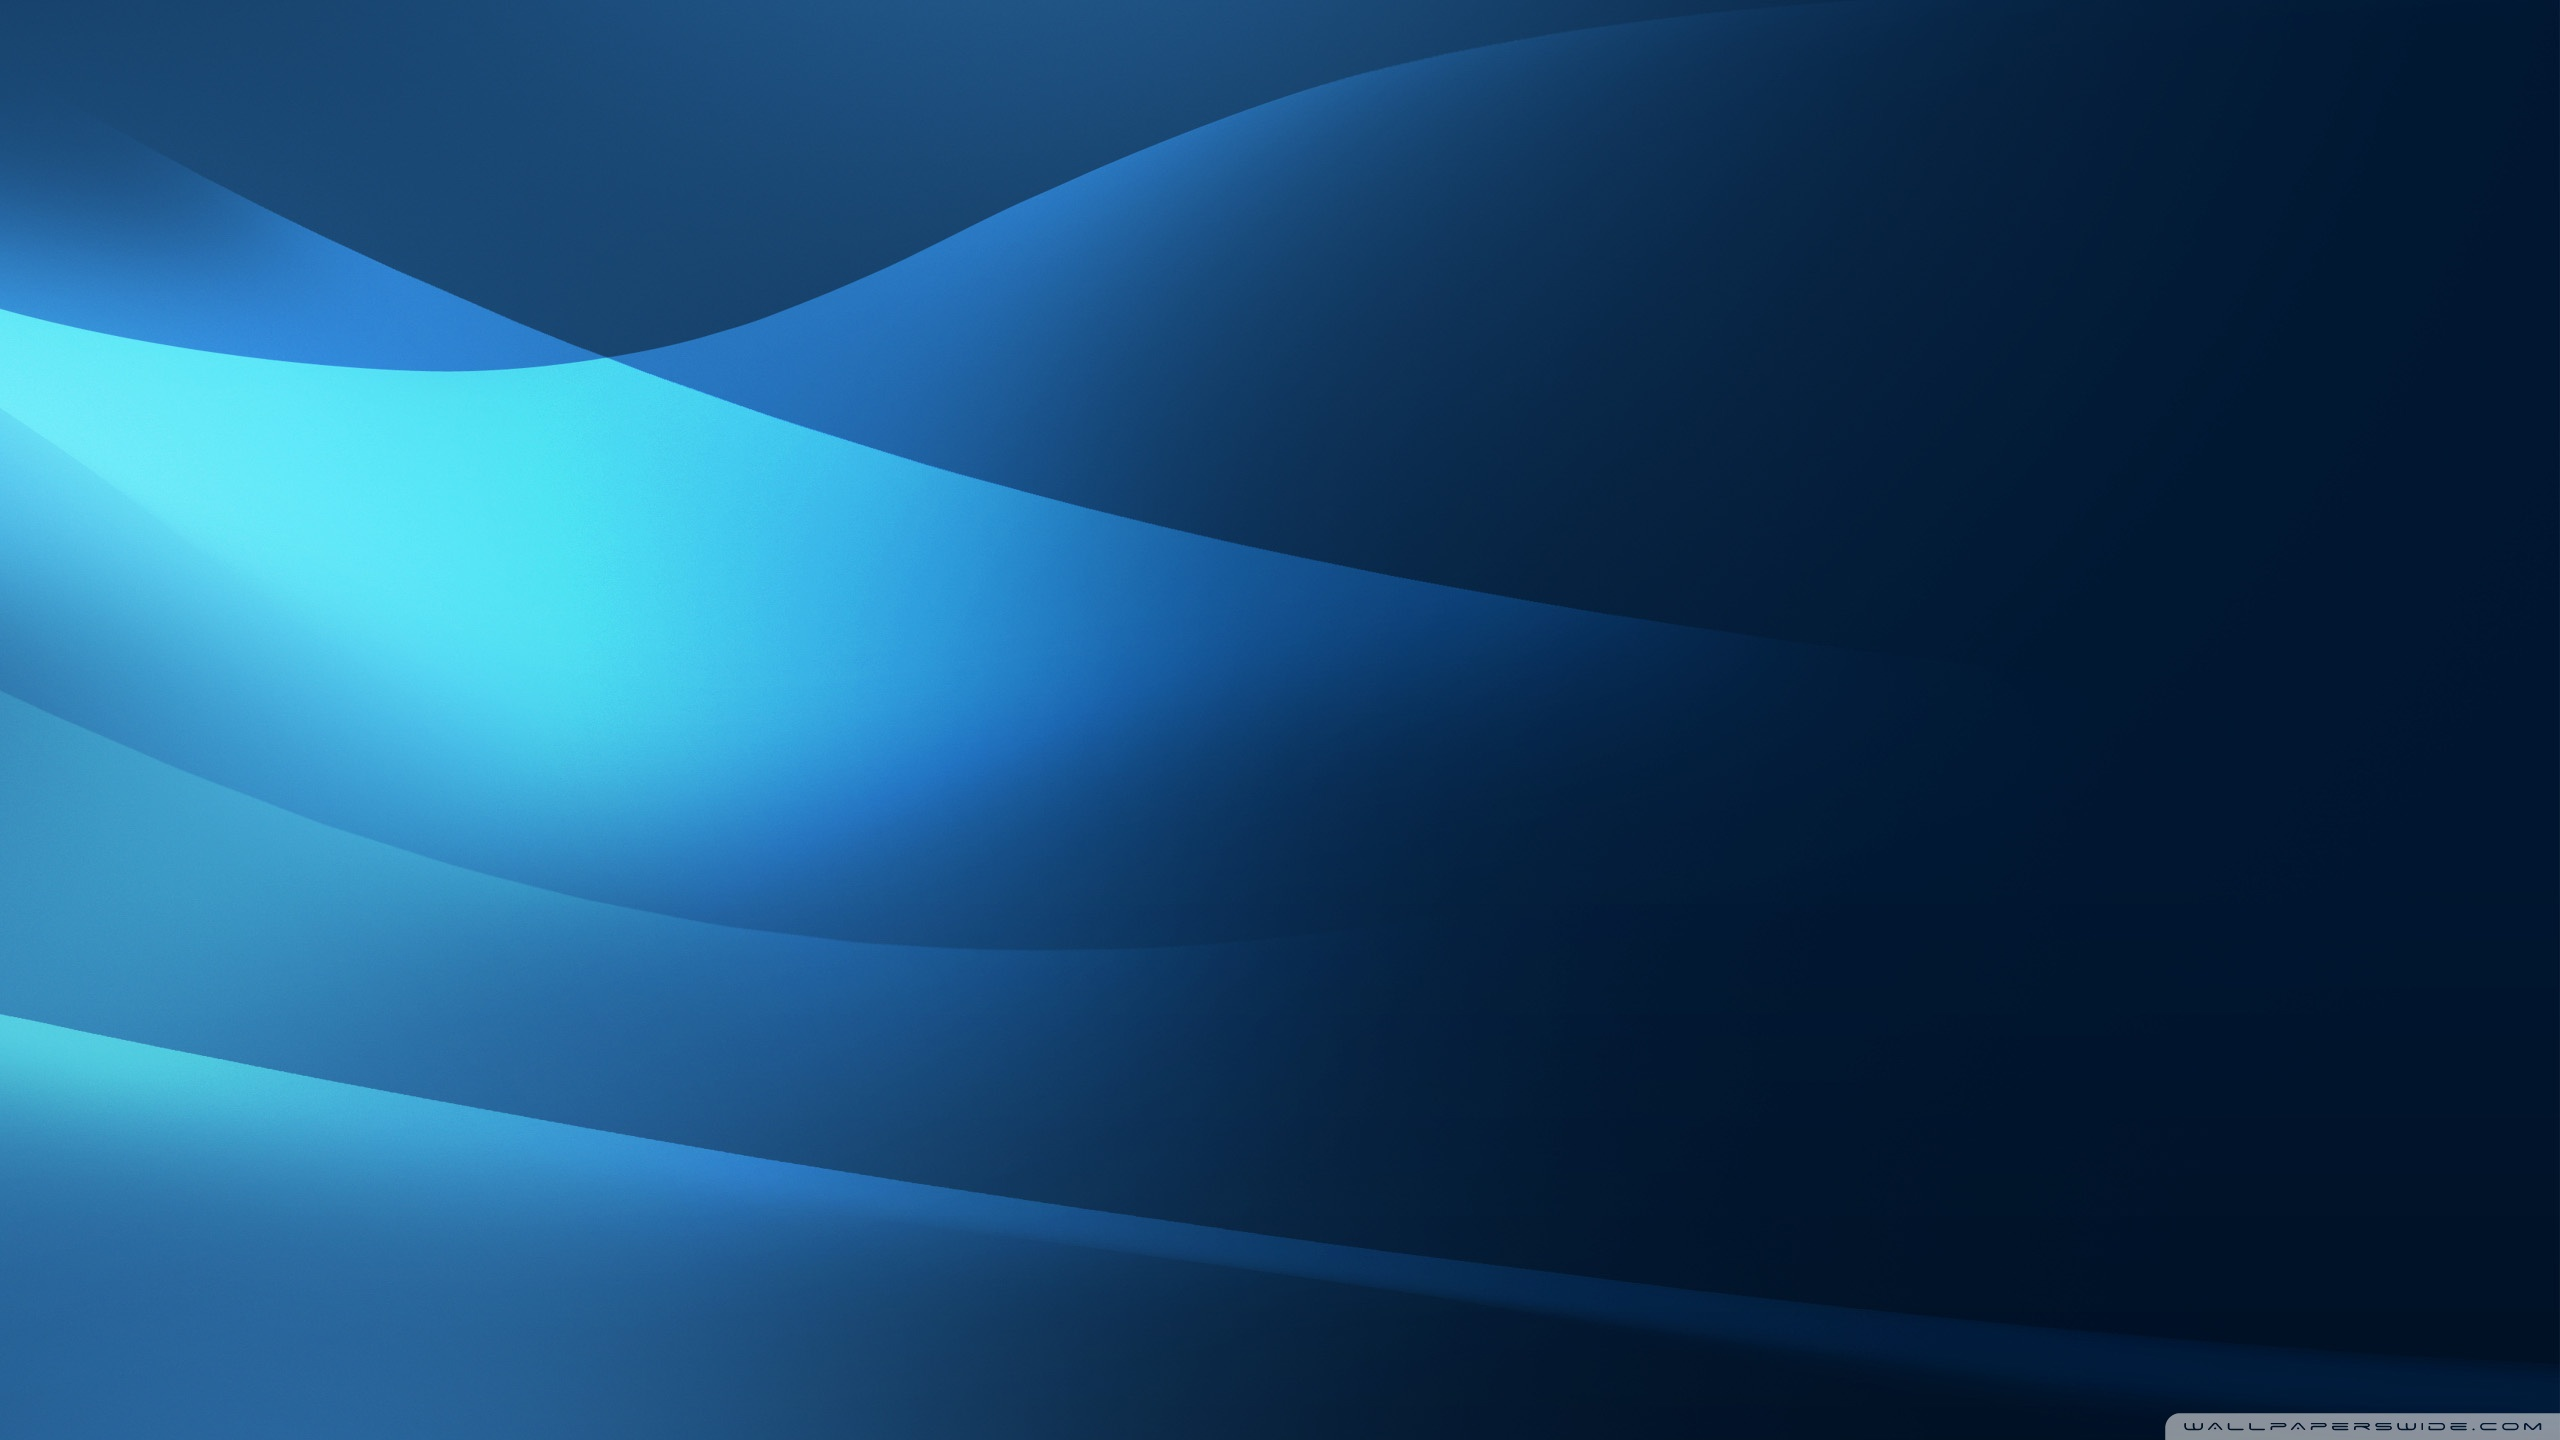 Desktop Abstract Wallpaper 2560x1440